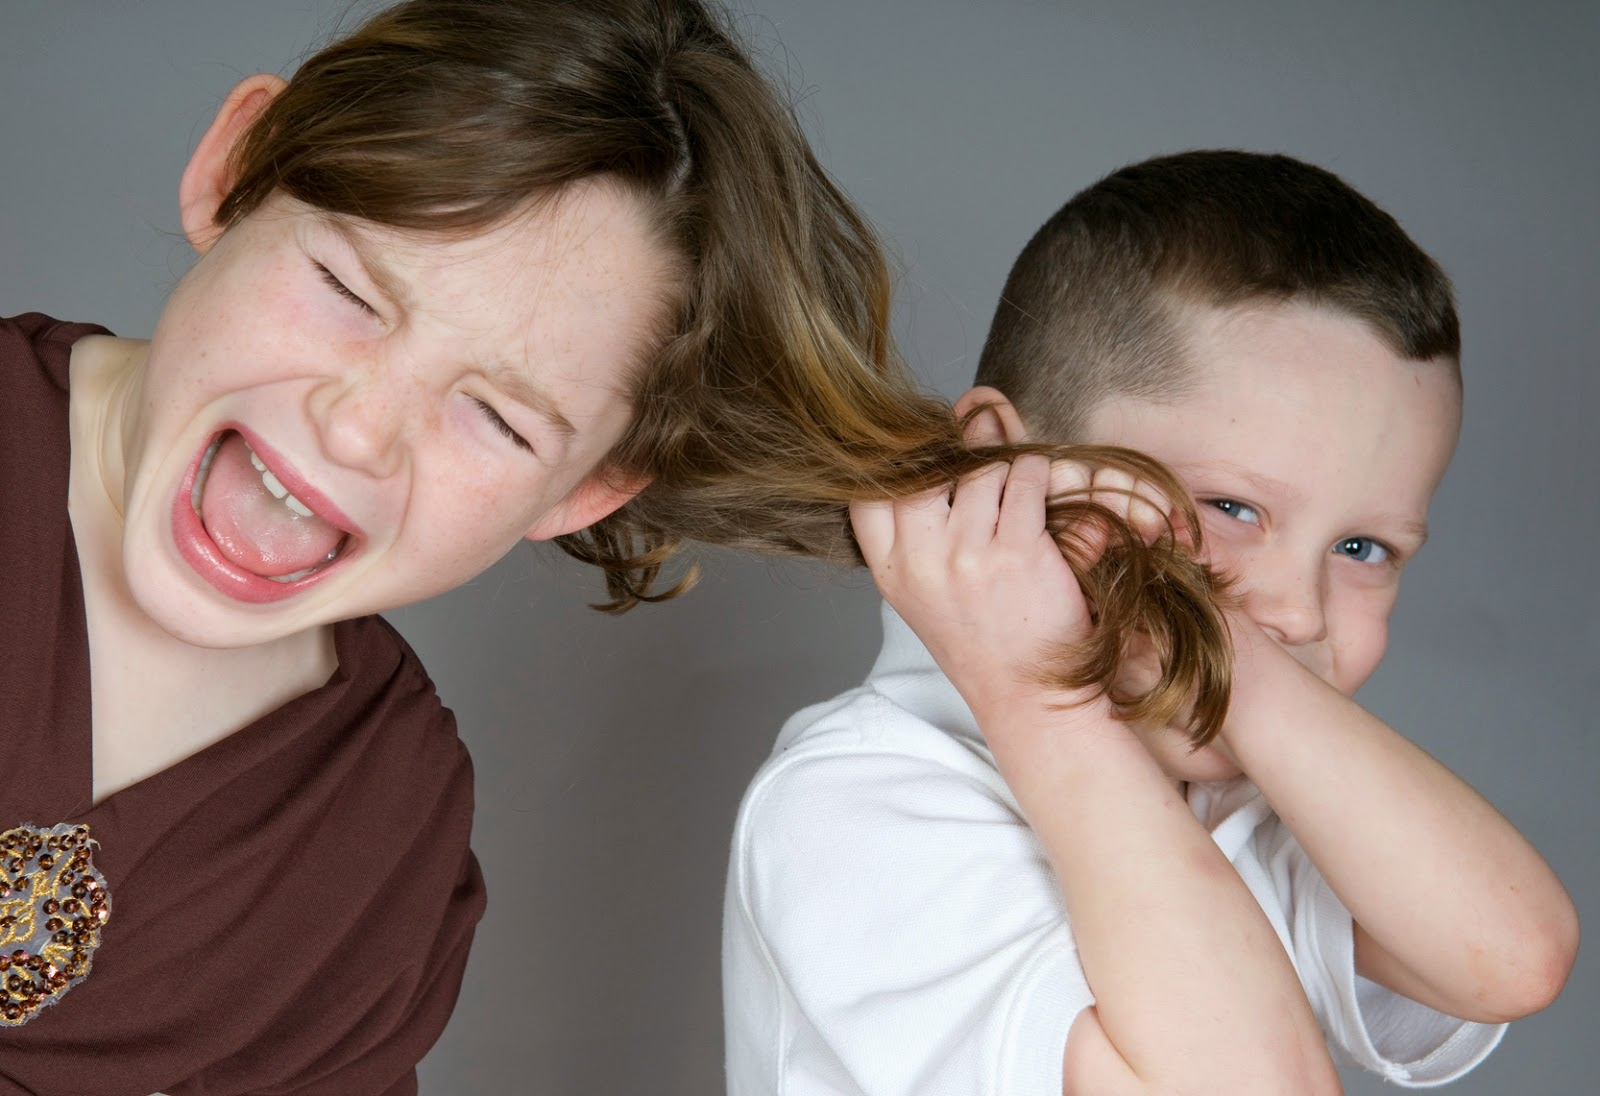 Bagaimana Menangani Akhlak Buruk Anak-Anak